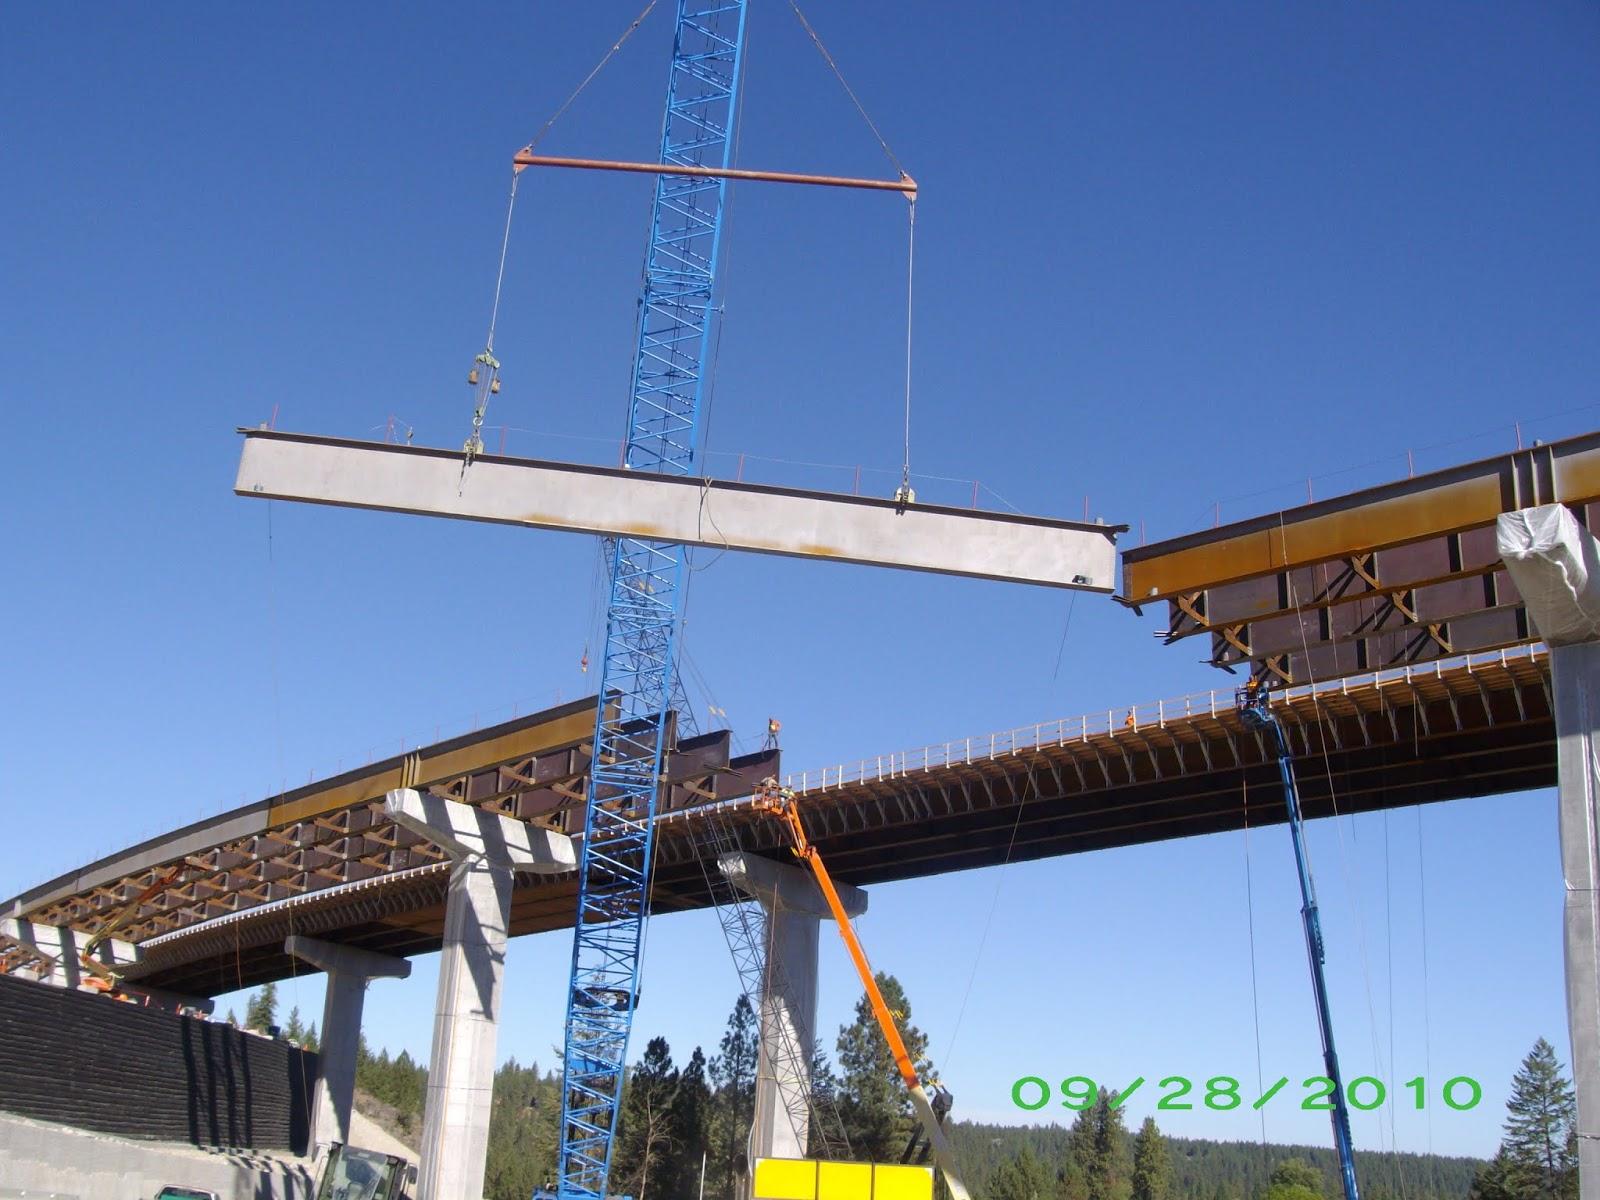 The WSDOT Blog - Washington State Department of Transportation: June